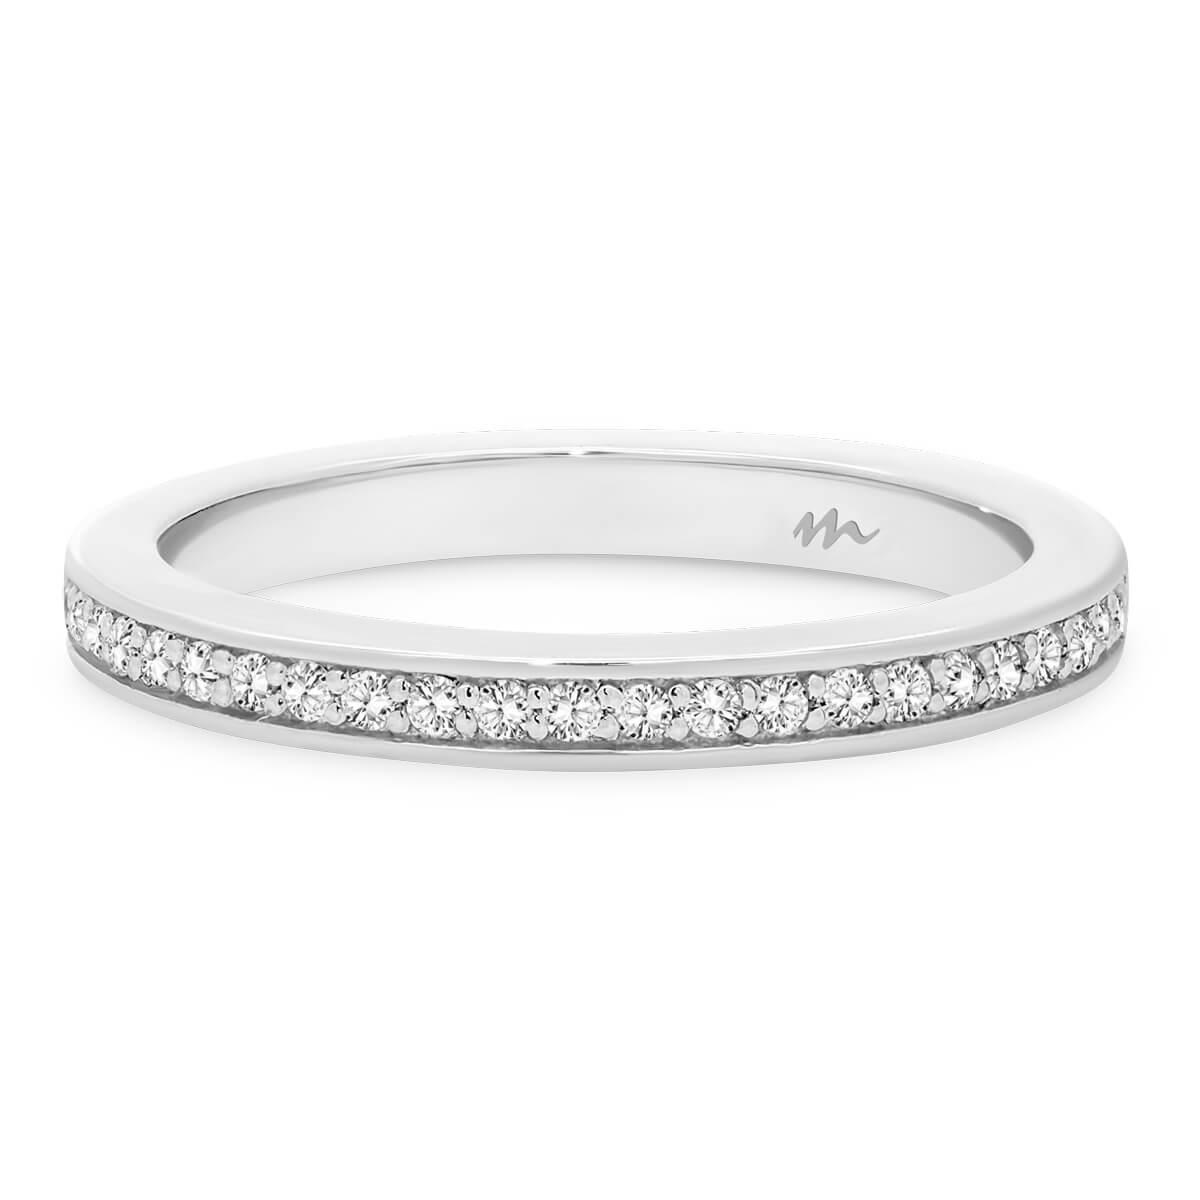 Millie 1.1 Pave set Moissanite wedding ring